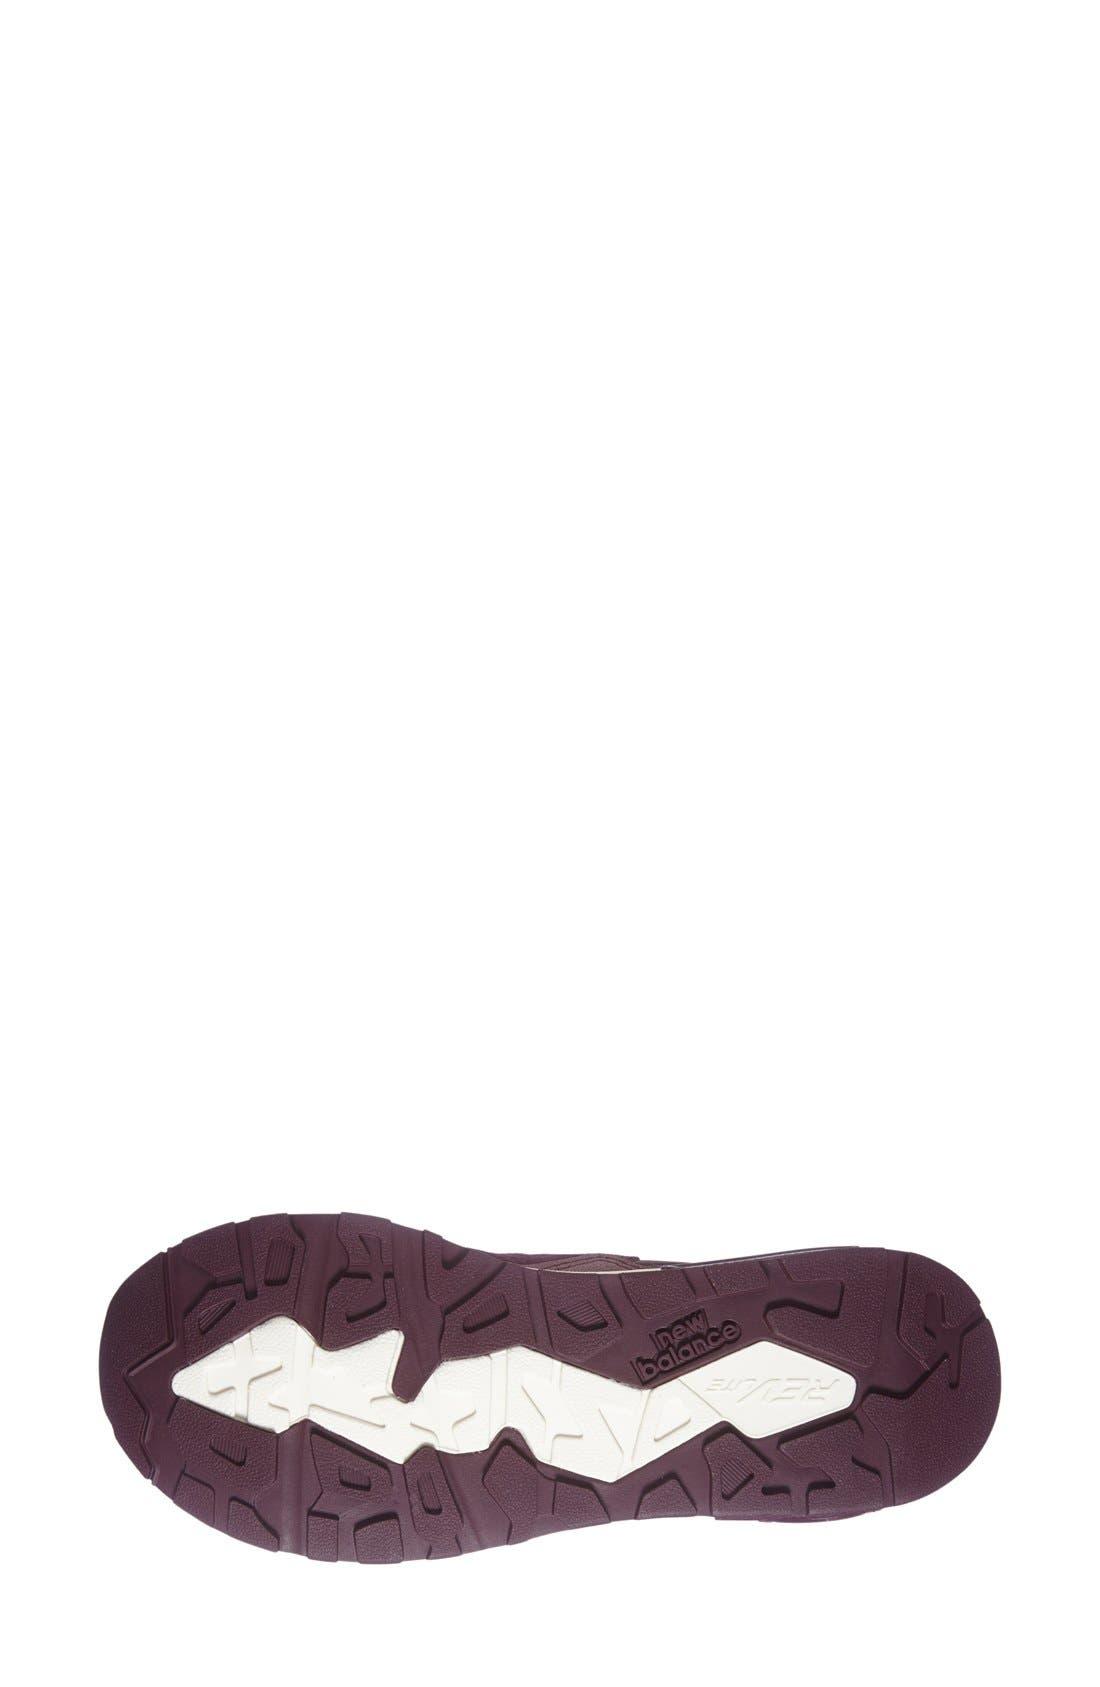 Alternate Image 4  - New Balance '580' Sneaker (Women)